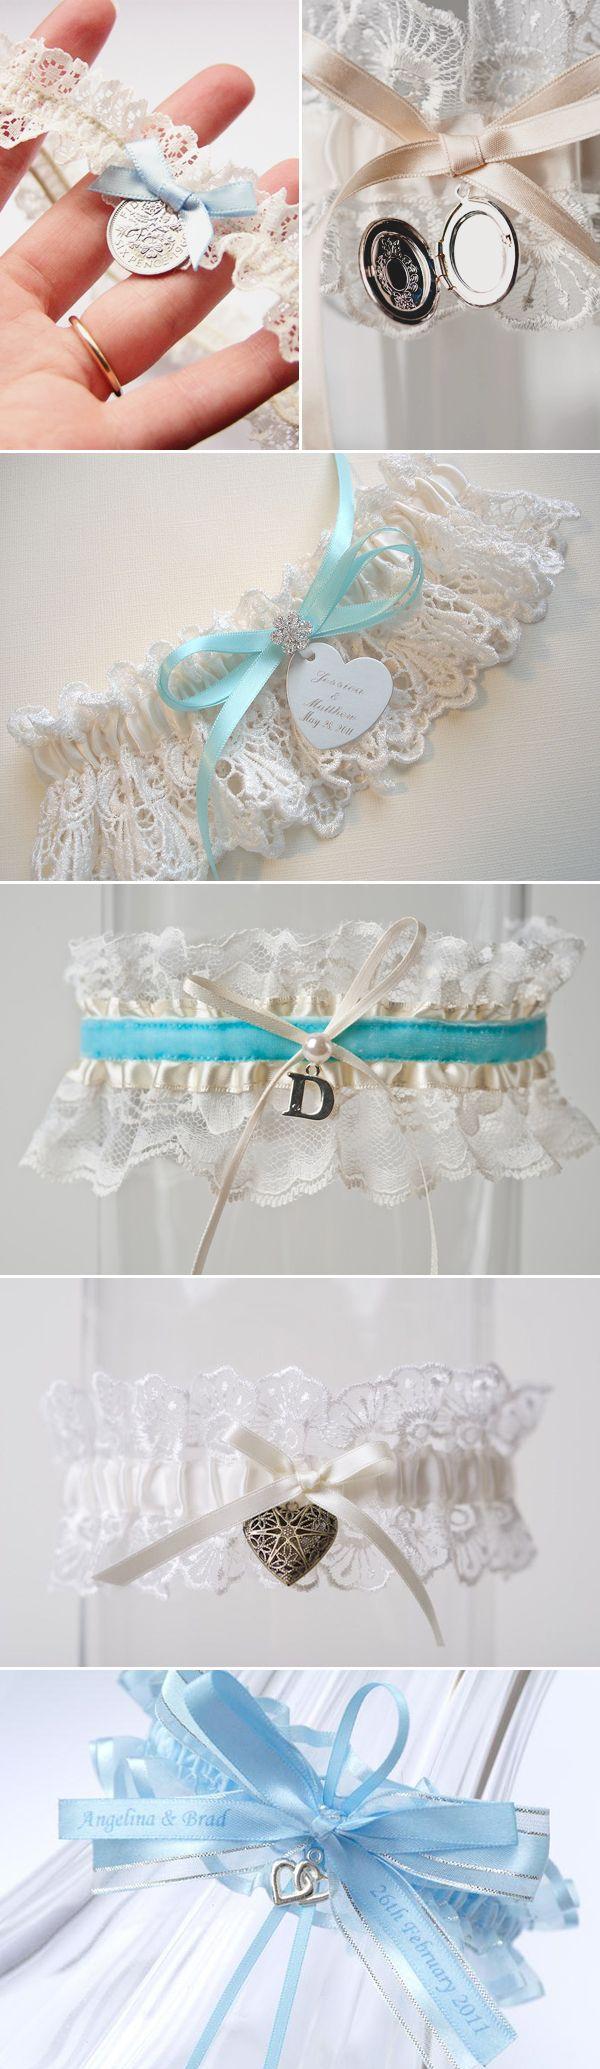 20 Utterly Romantic Bridal Garters - Personalized Garters